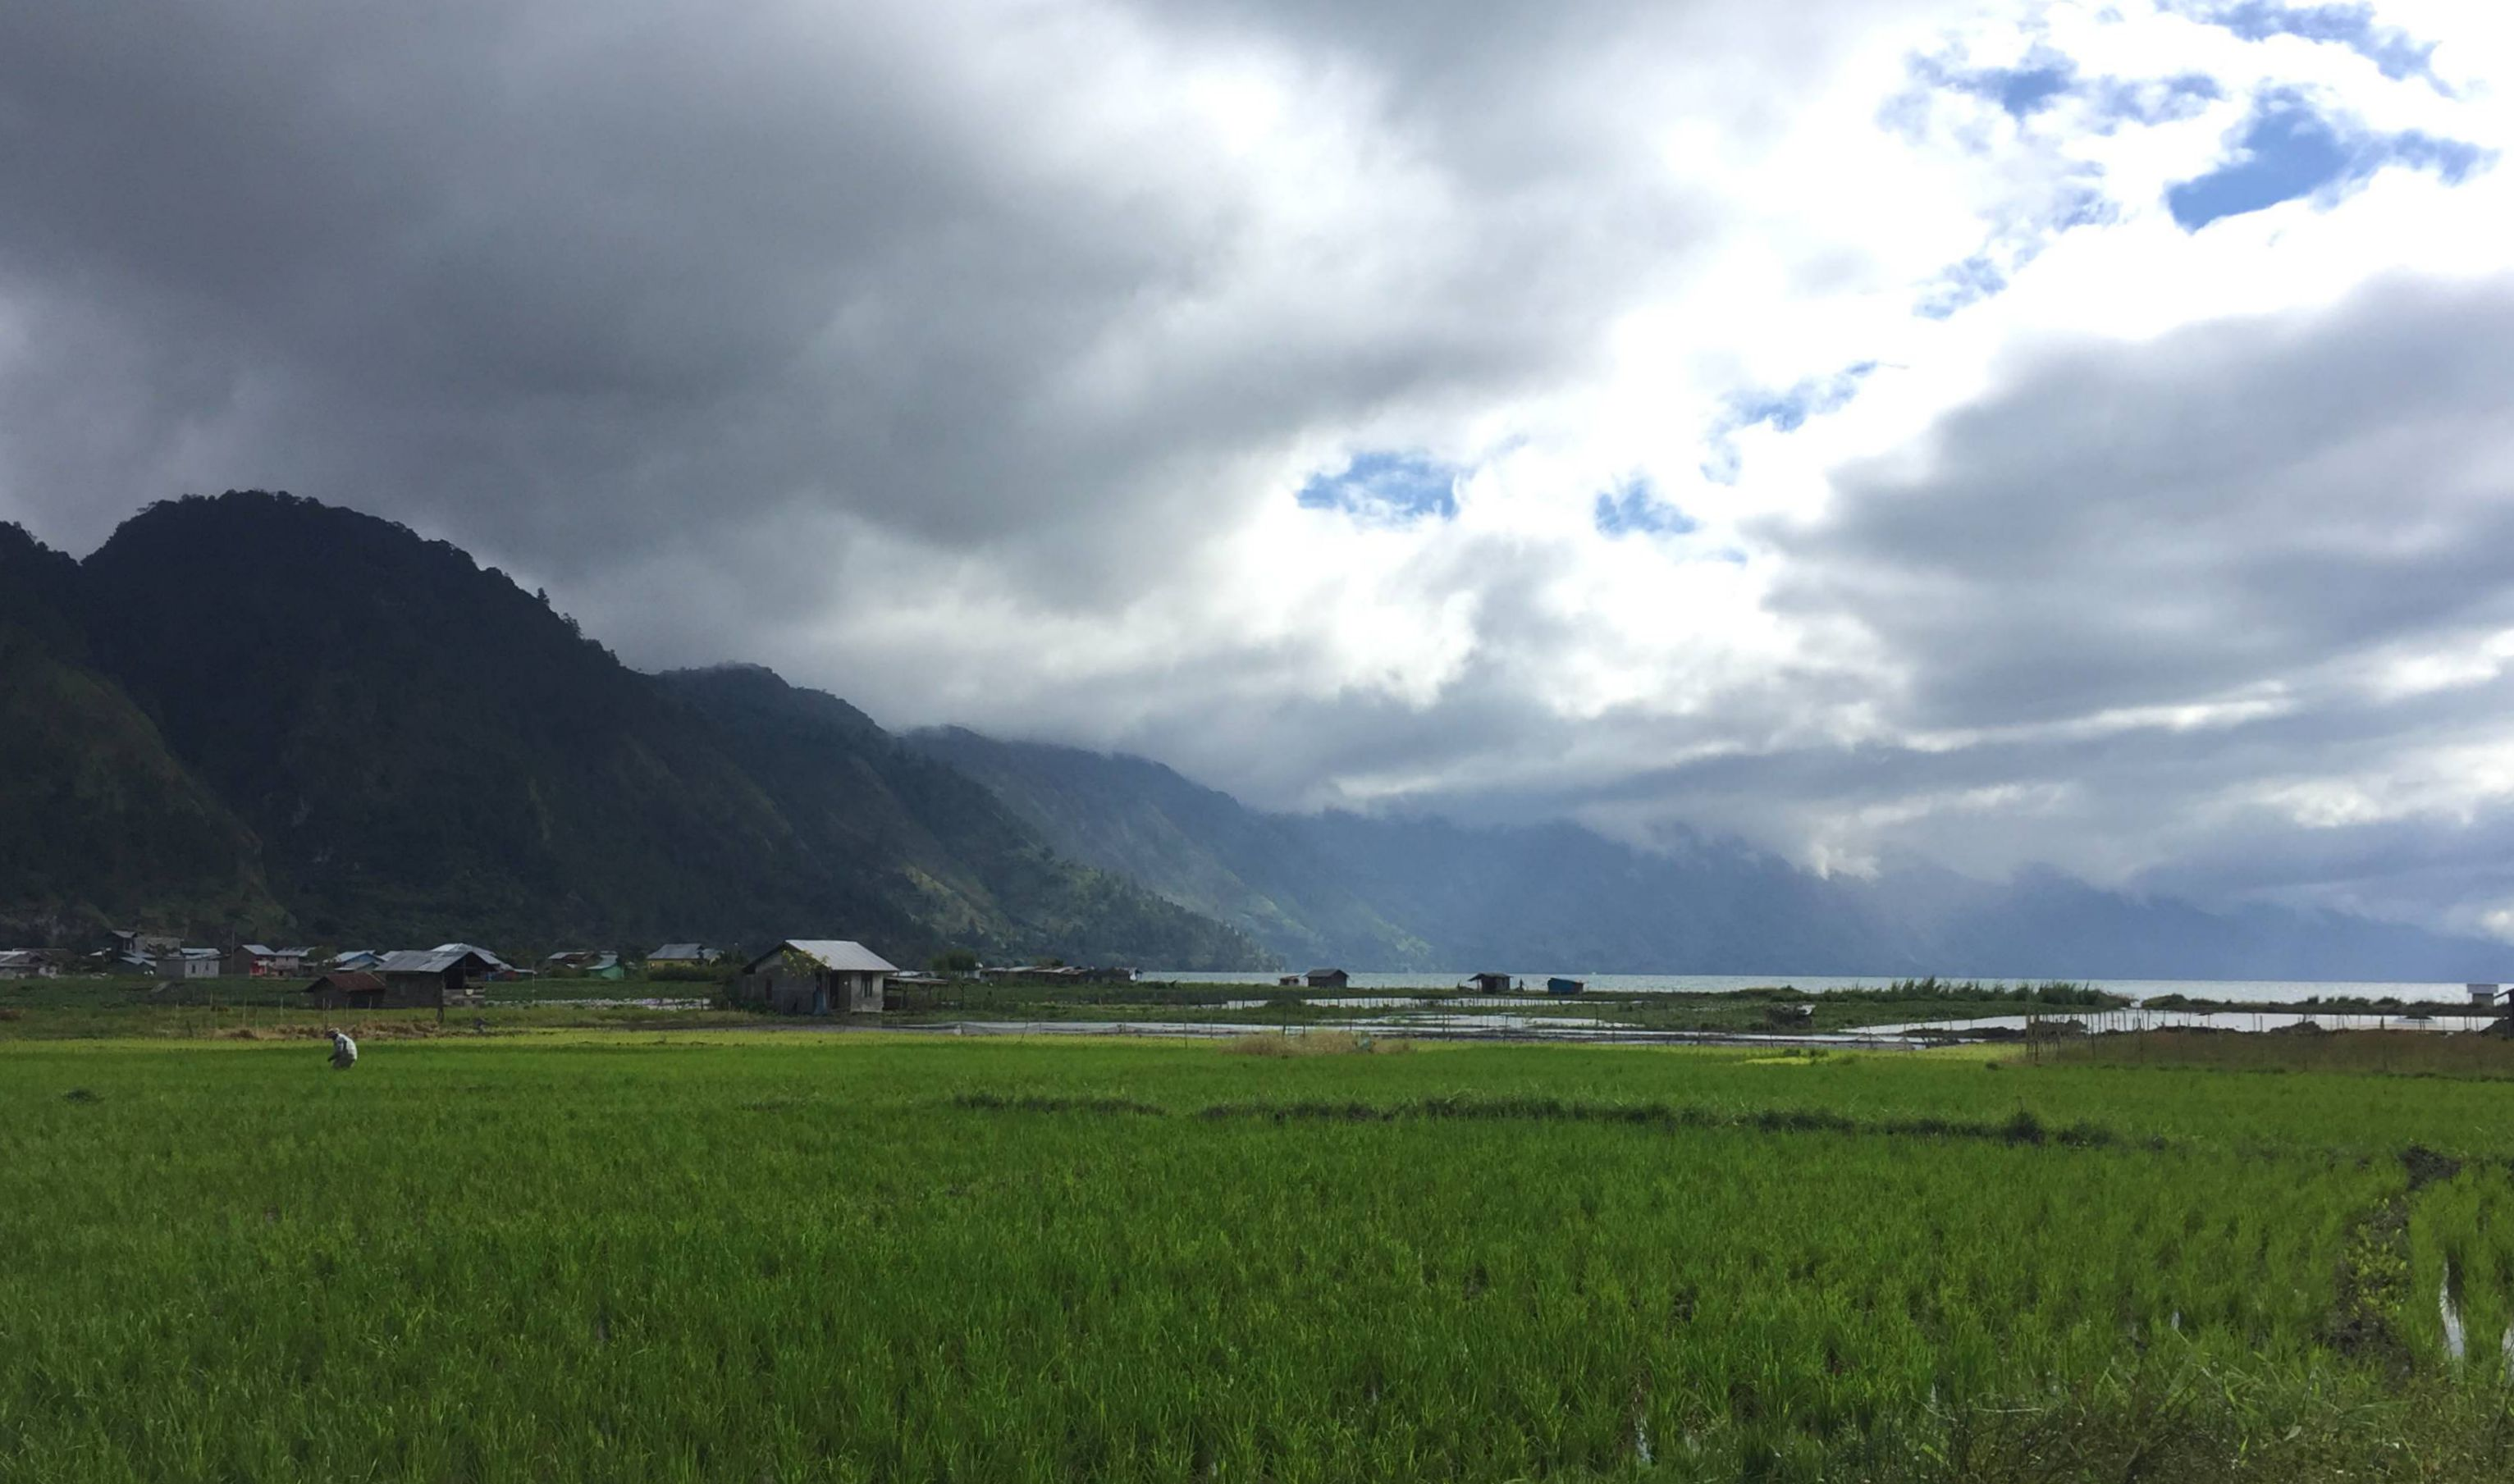 Tepian Danau Takengon, Aceh Tengah @ Natalia Oetama